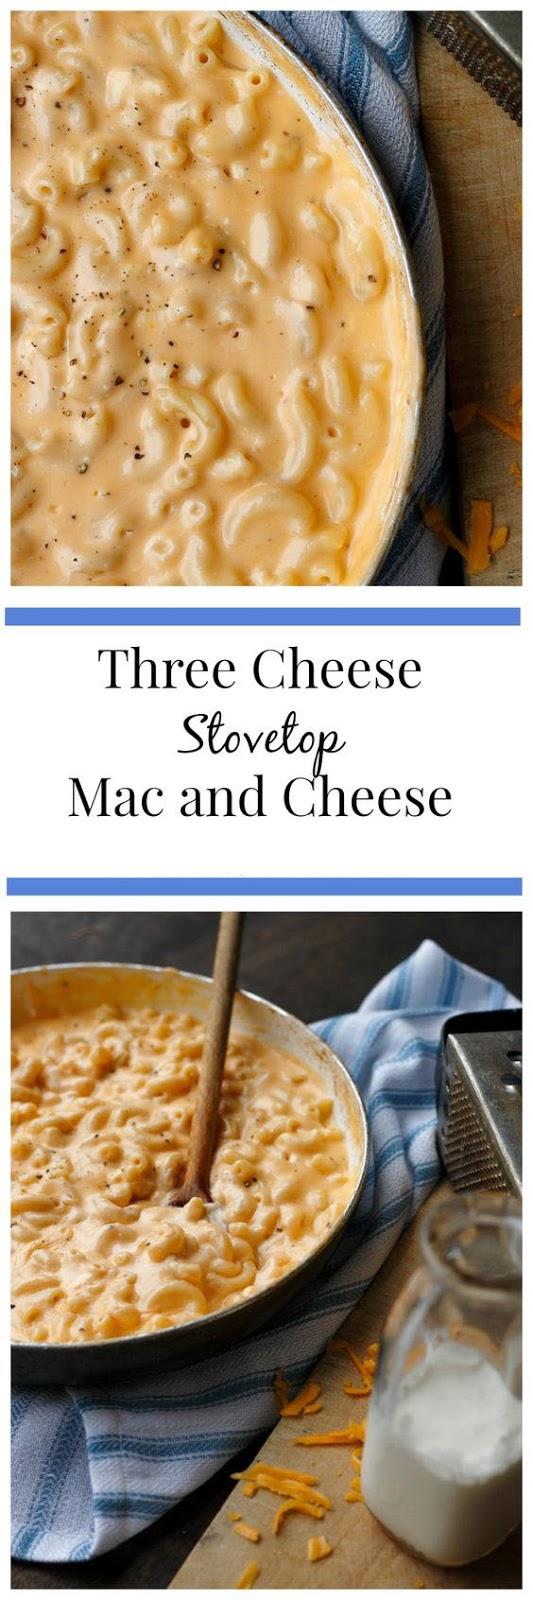 Three Cheese Stovetop Mac And Cheese